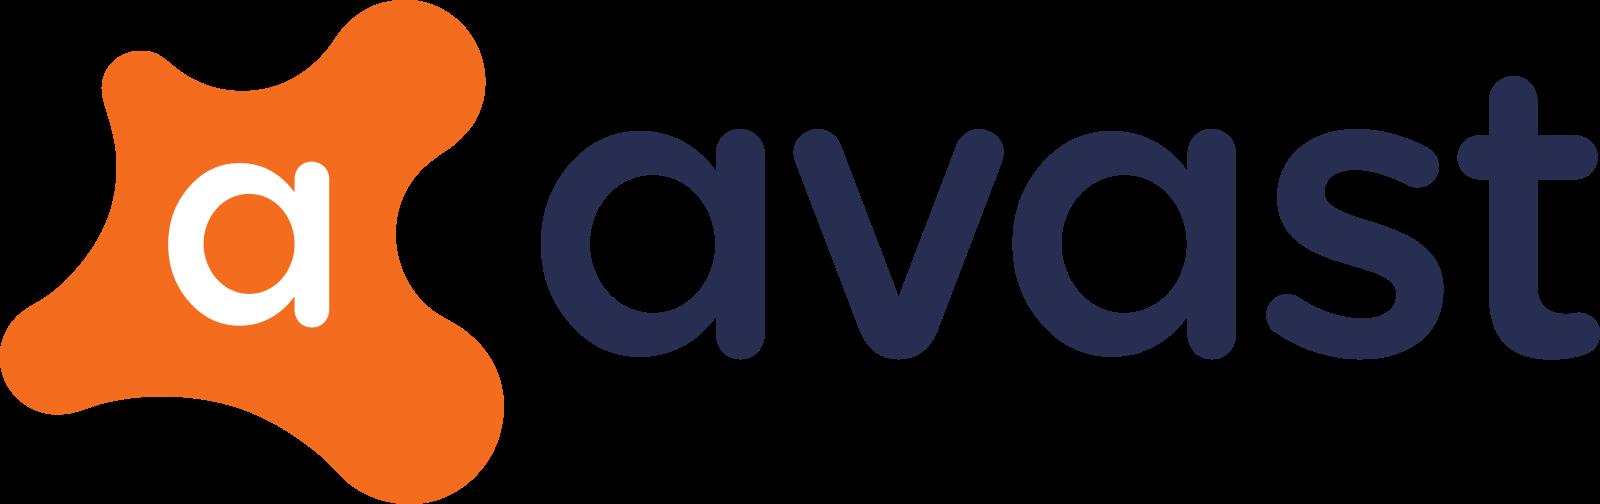 avast logo 4 - Avast Logo